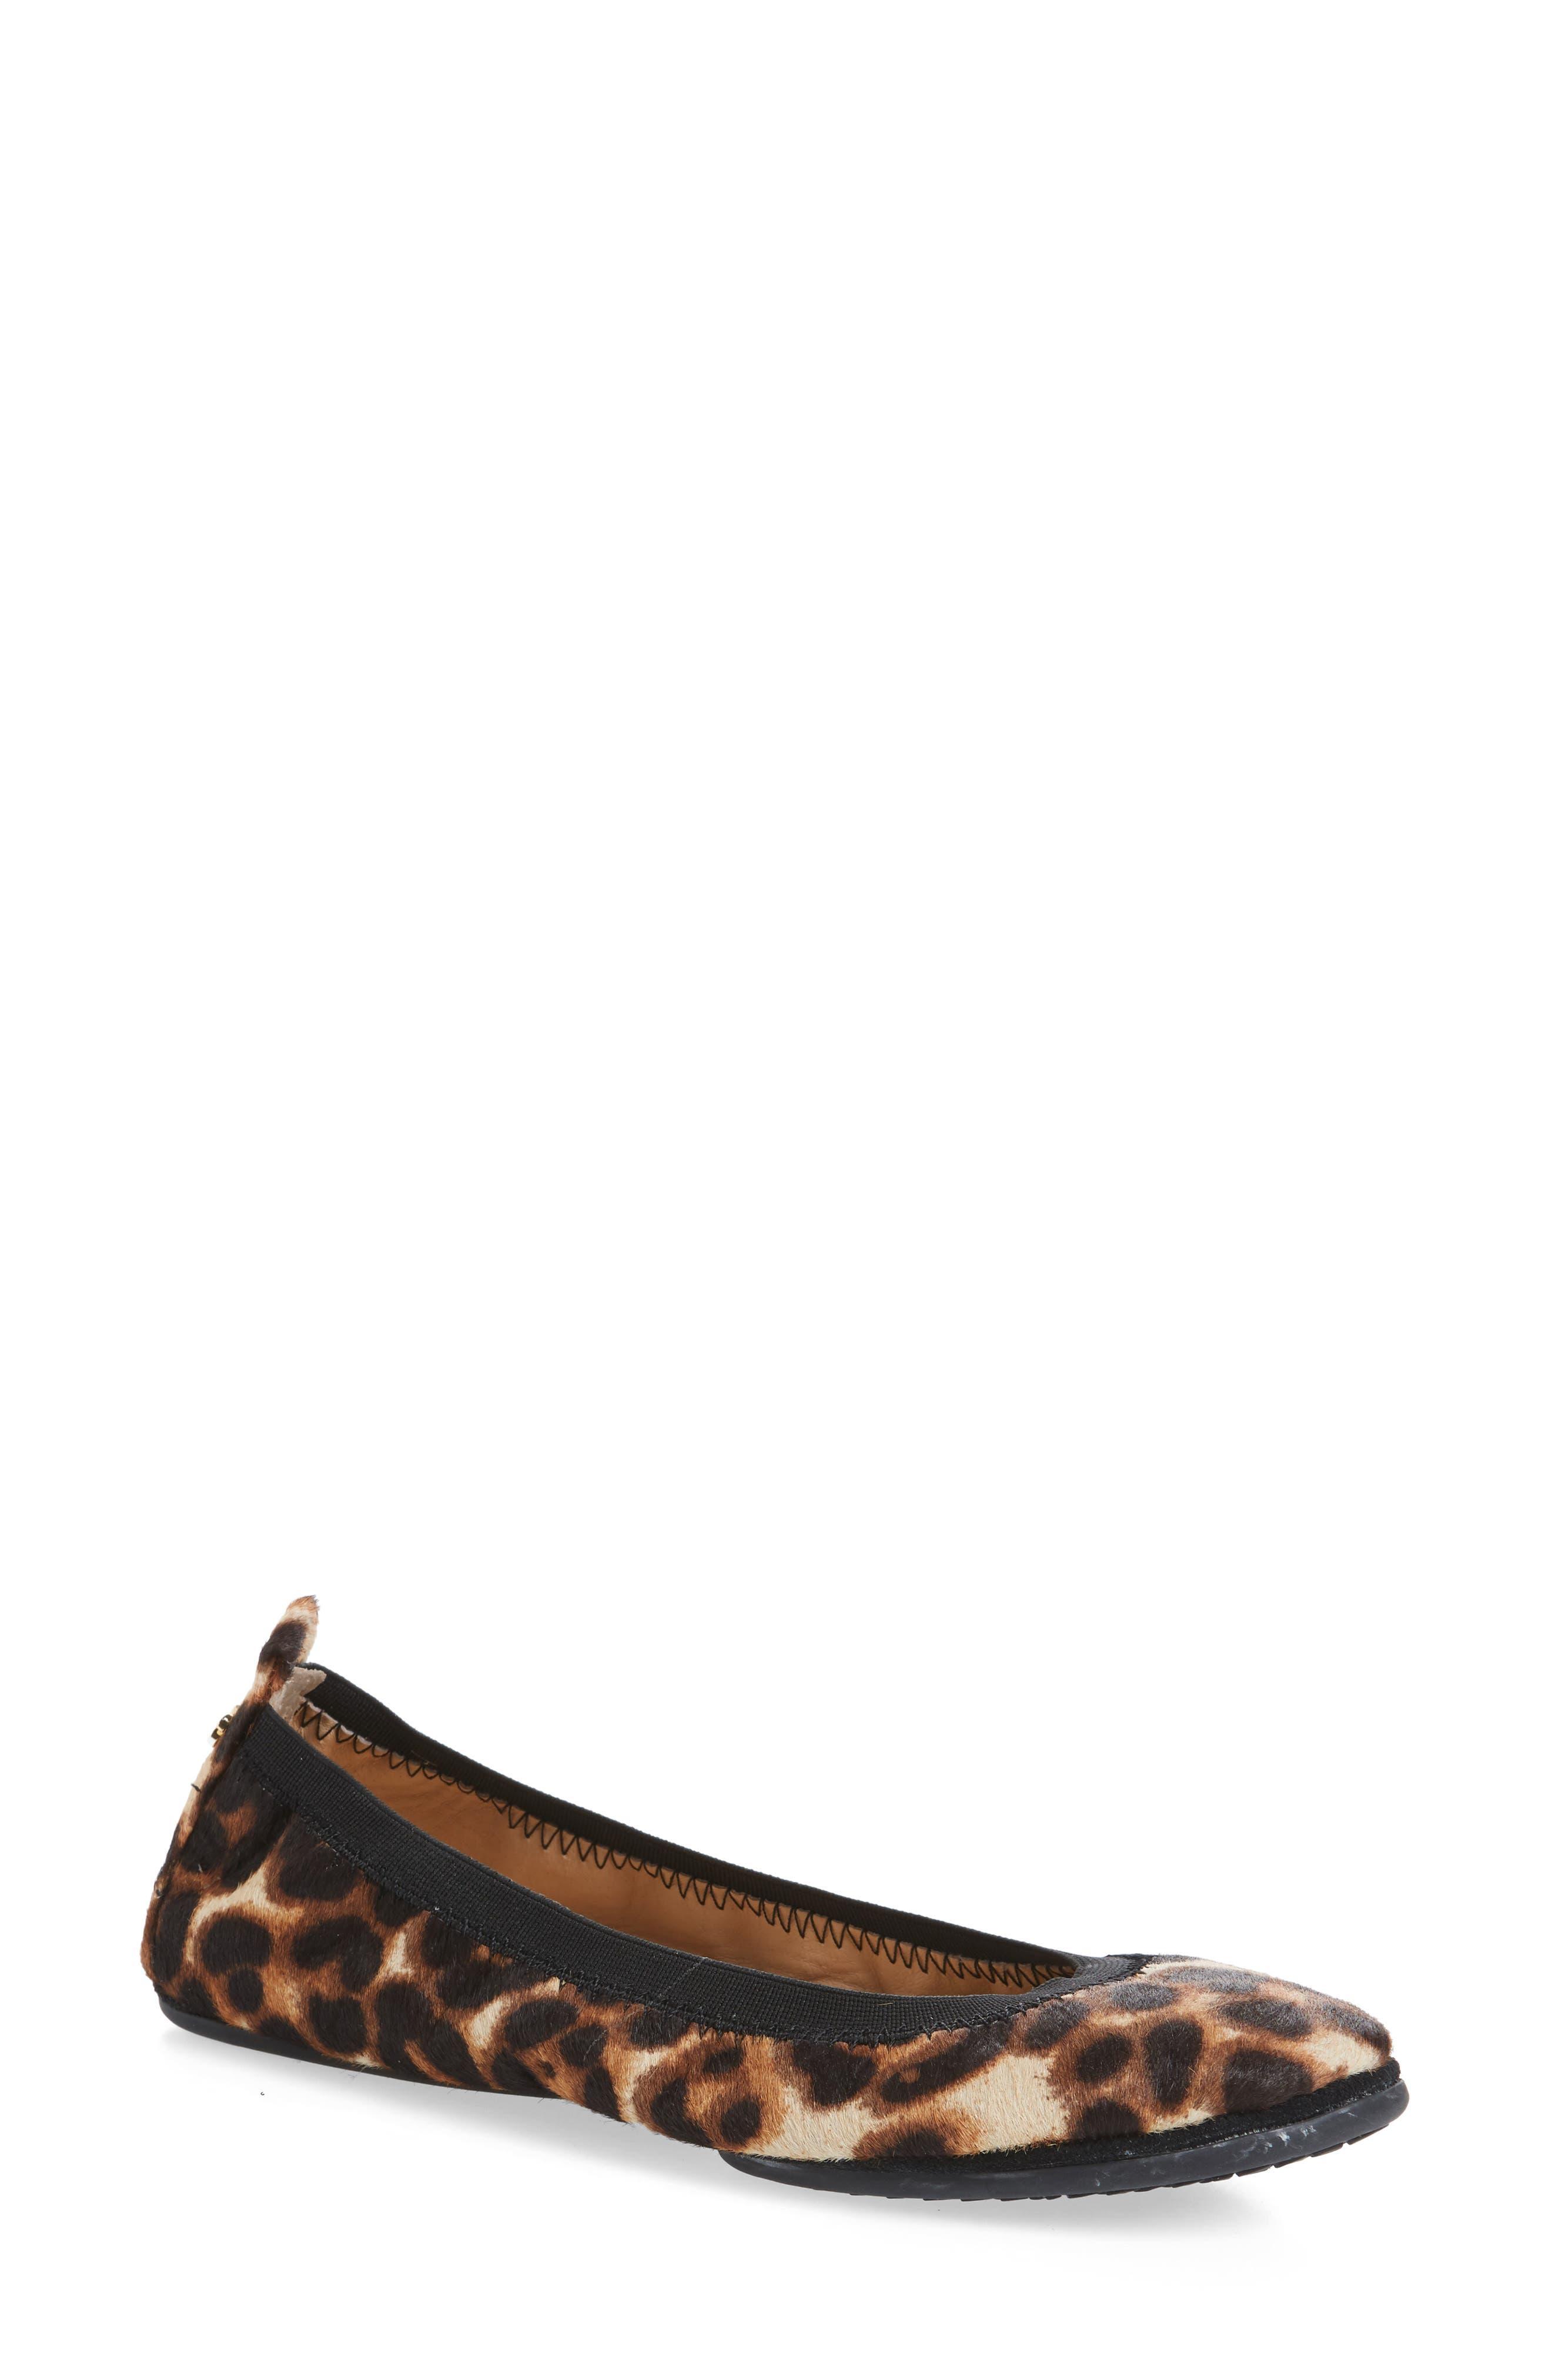 Samara Foldable Ballet Flat,                         Main,                         color, Natural Leopard Calf Hair